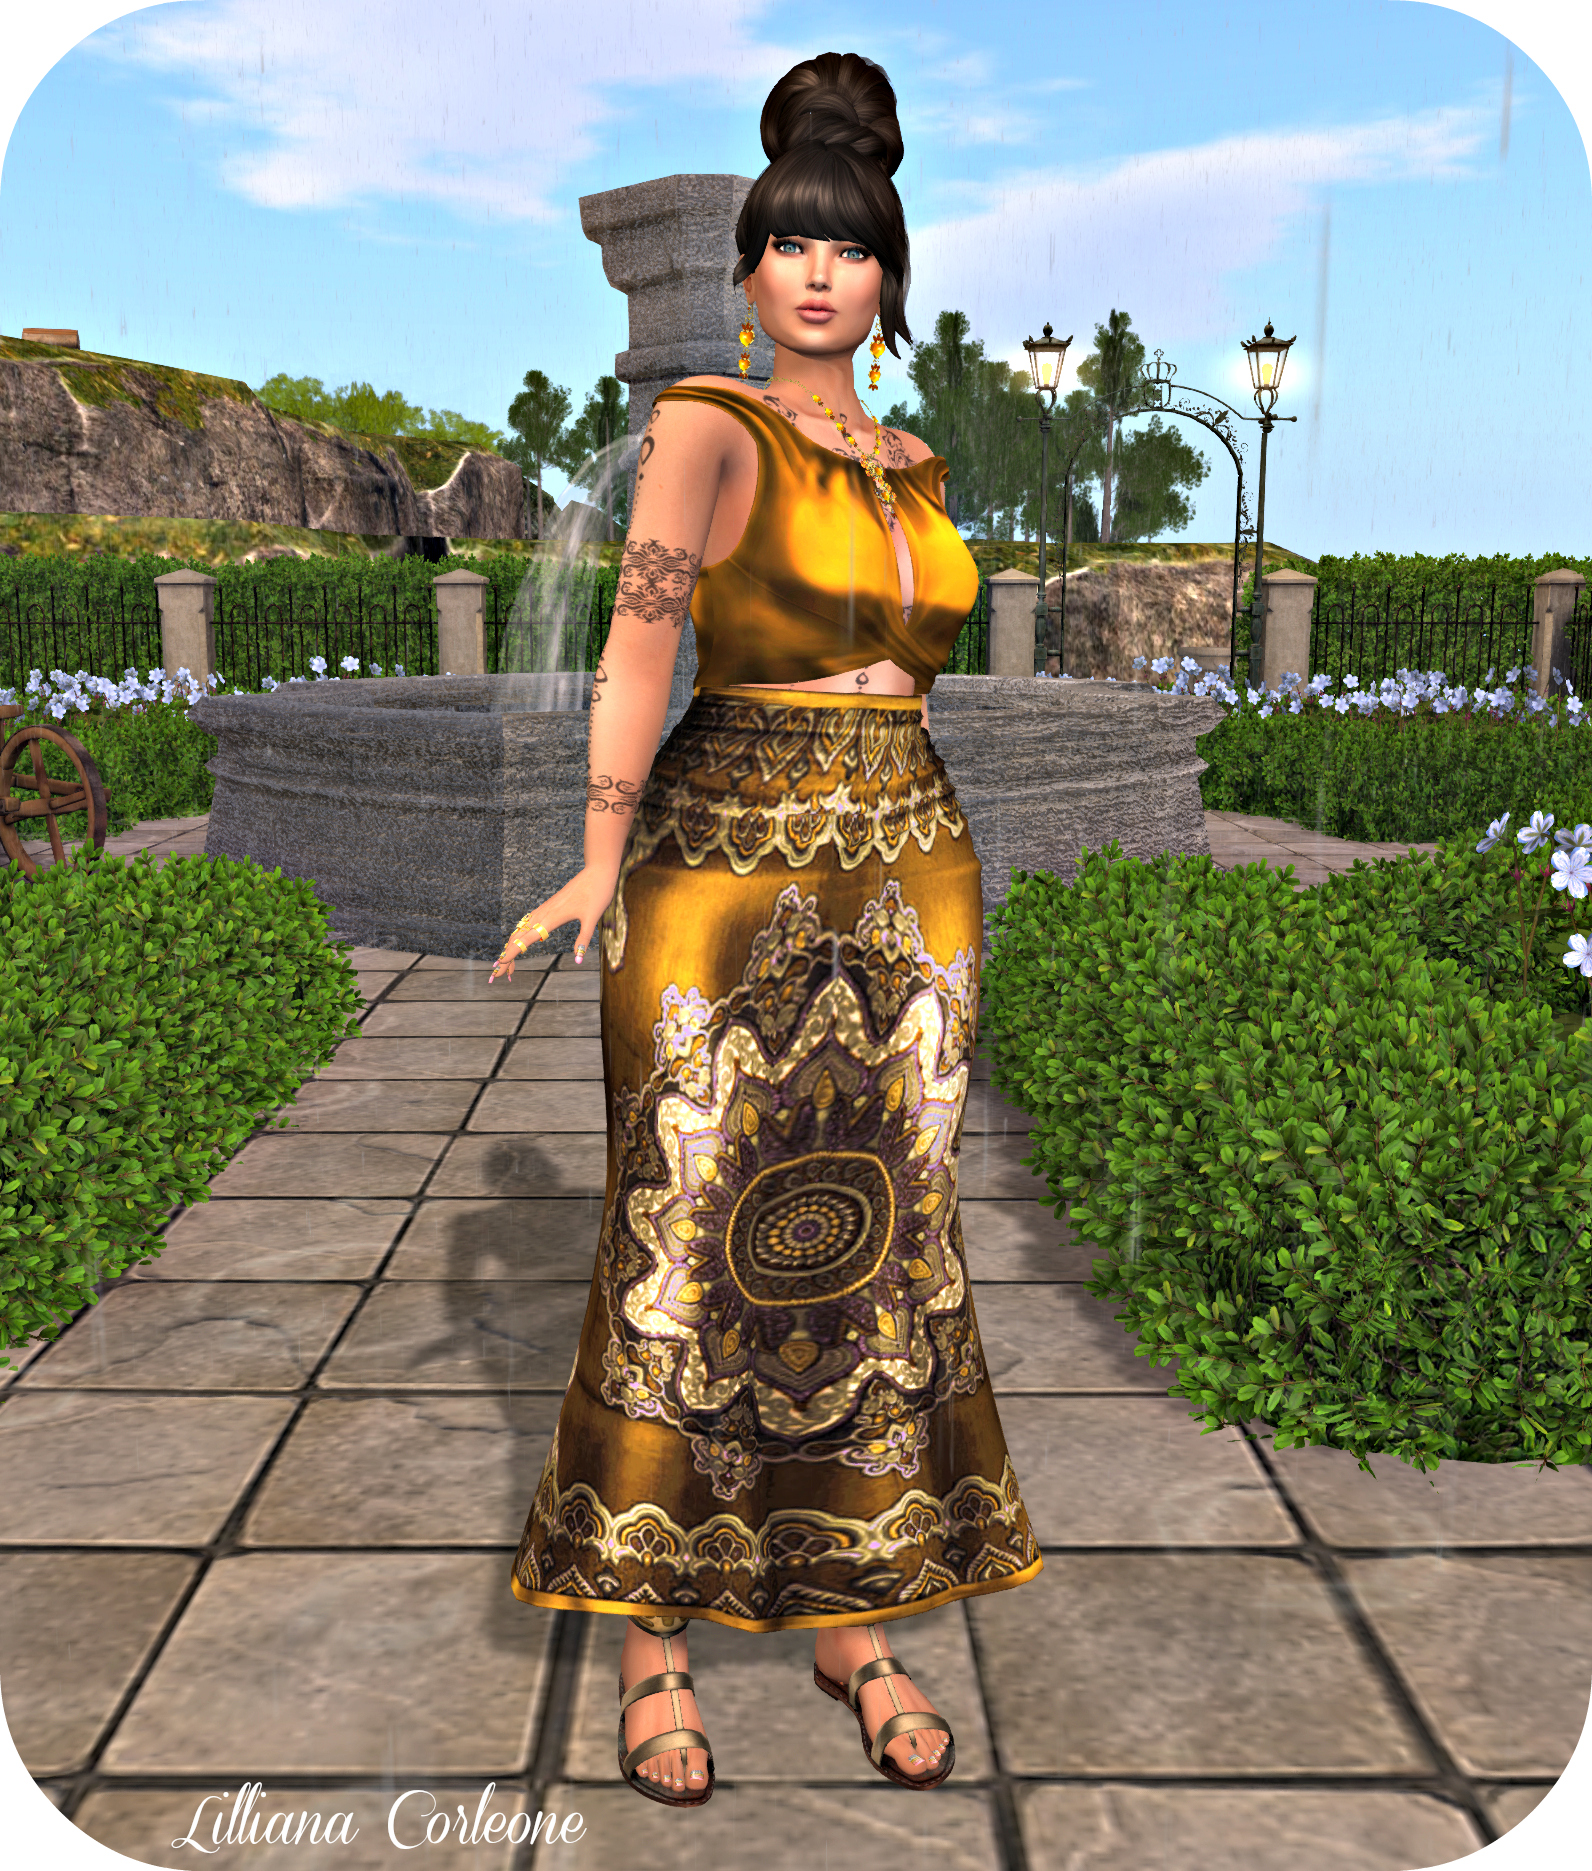 feb-25th-blog-post-photo-2_cropped